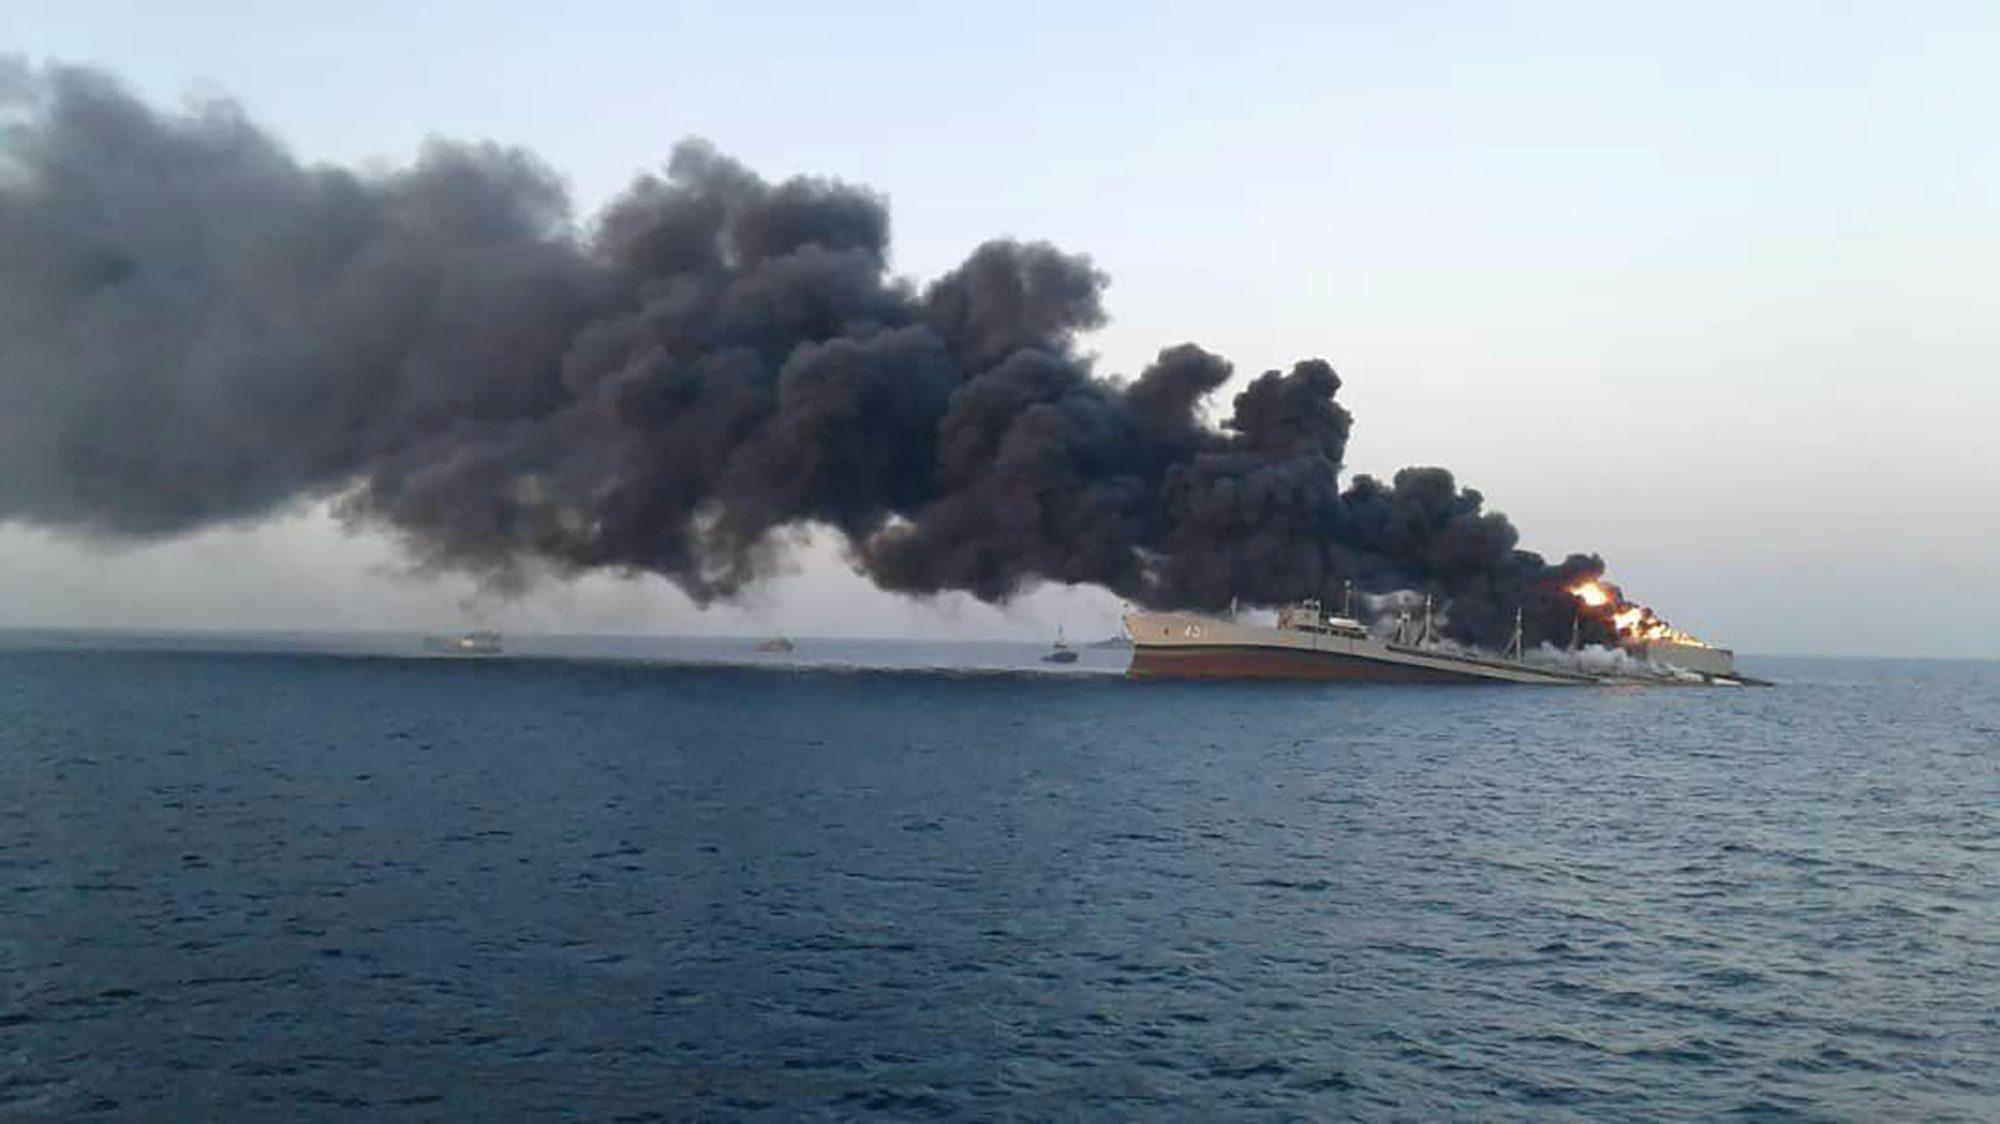 iran navy ship sinking